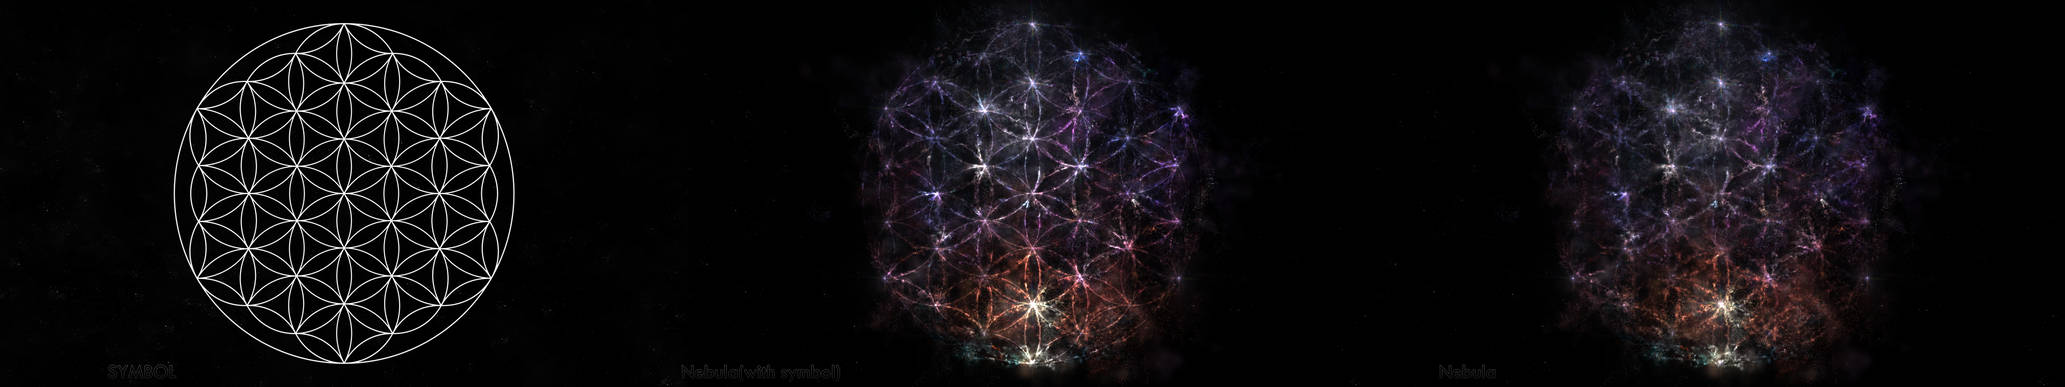 Flower Of Life - Nebula